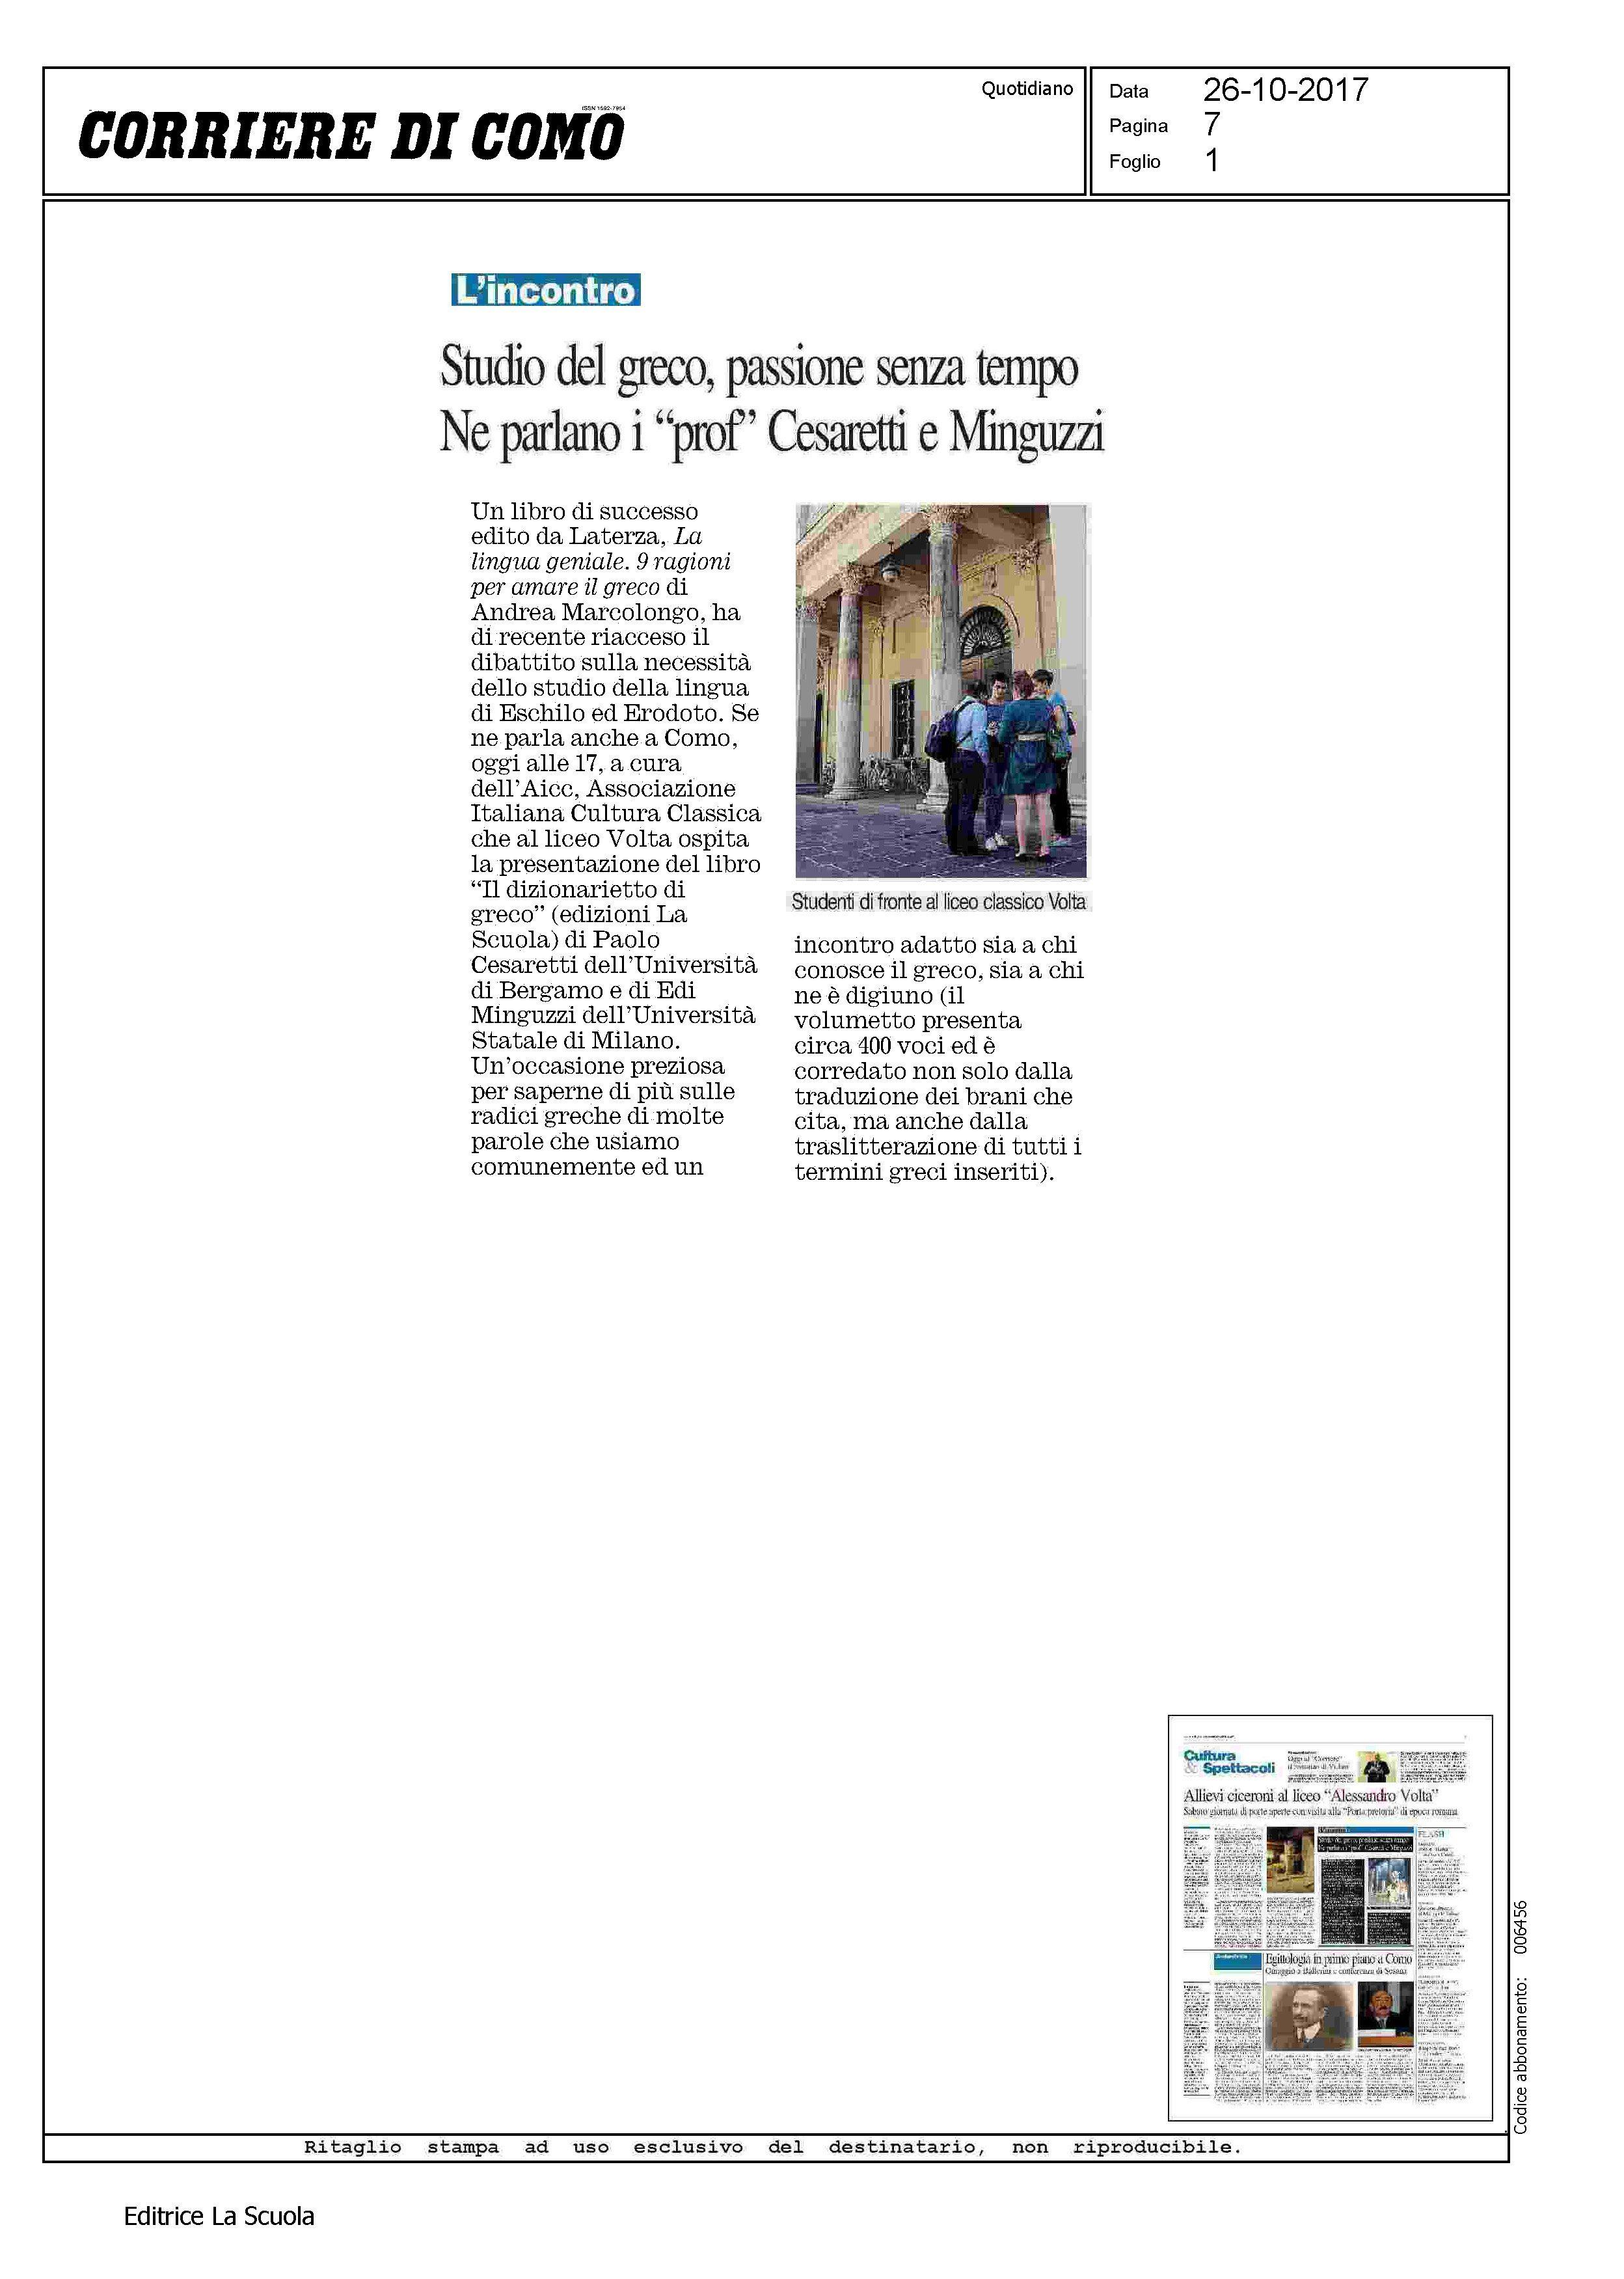 Els Corriere di Como 26 10 2017 Dizionar